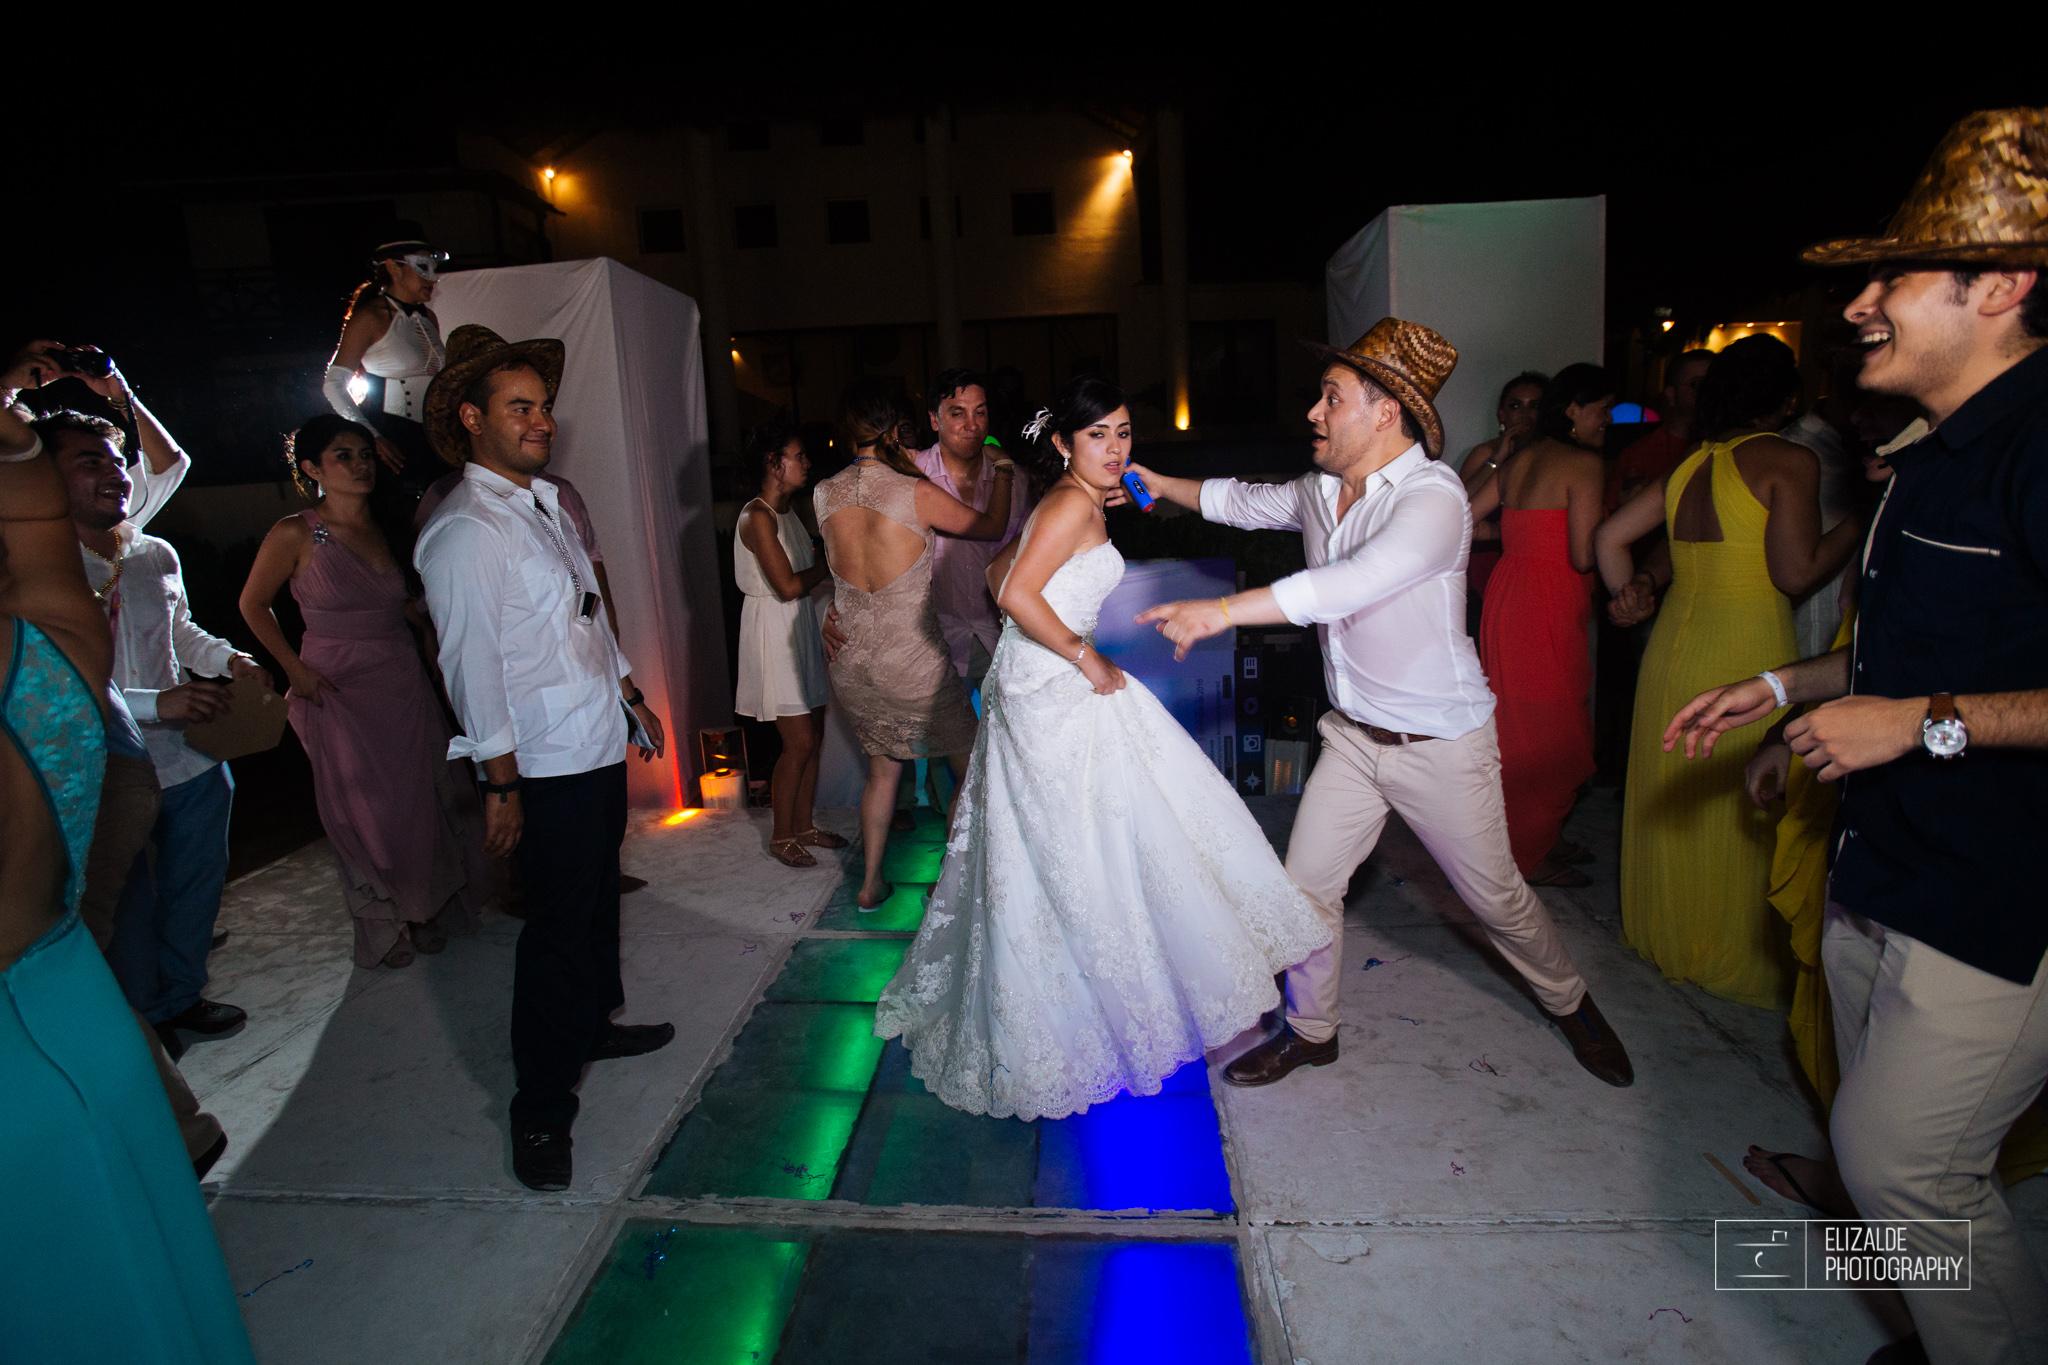 Pay and Ferran_Acapulco_Destination Wedding_Elizalde Photography-169.jpg